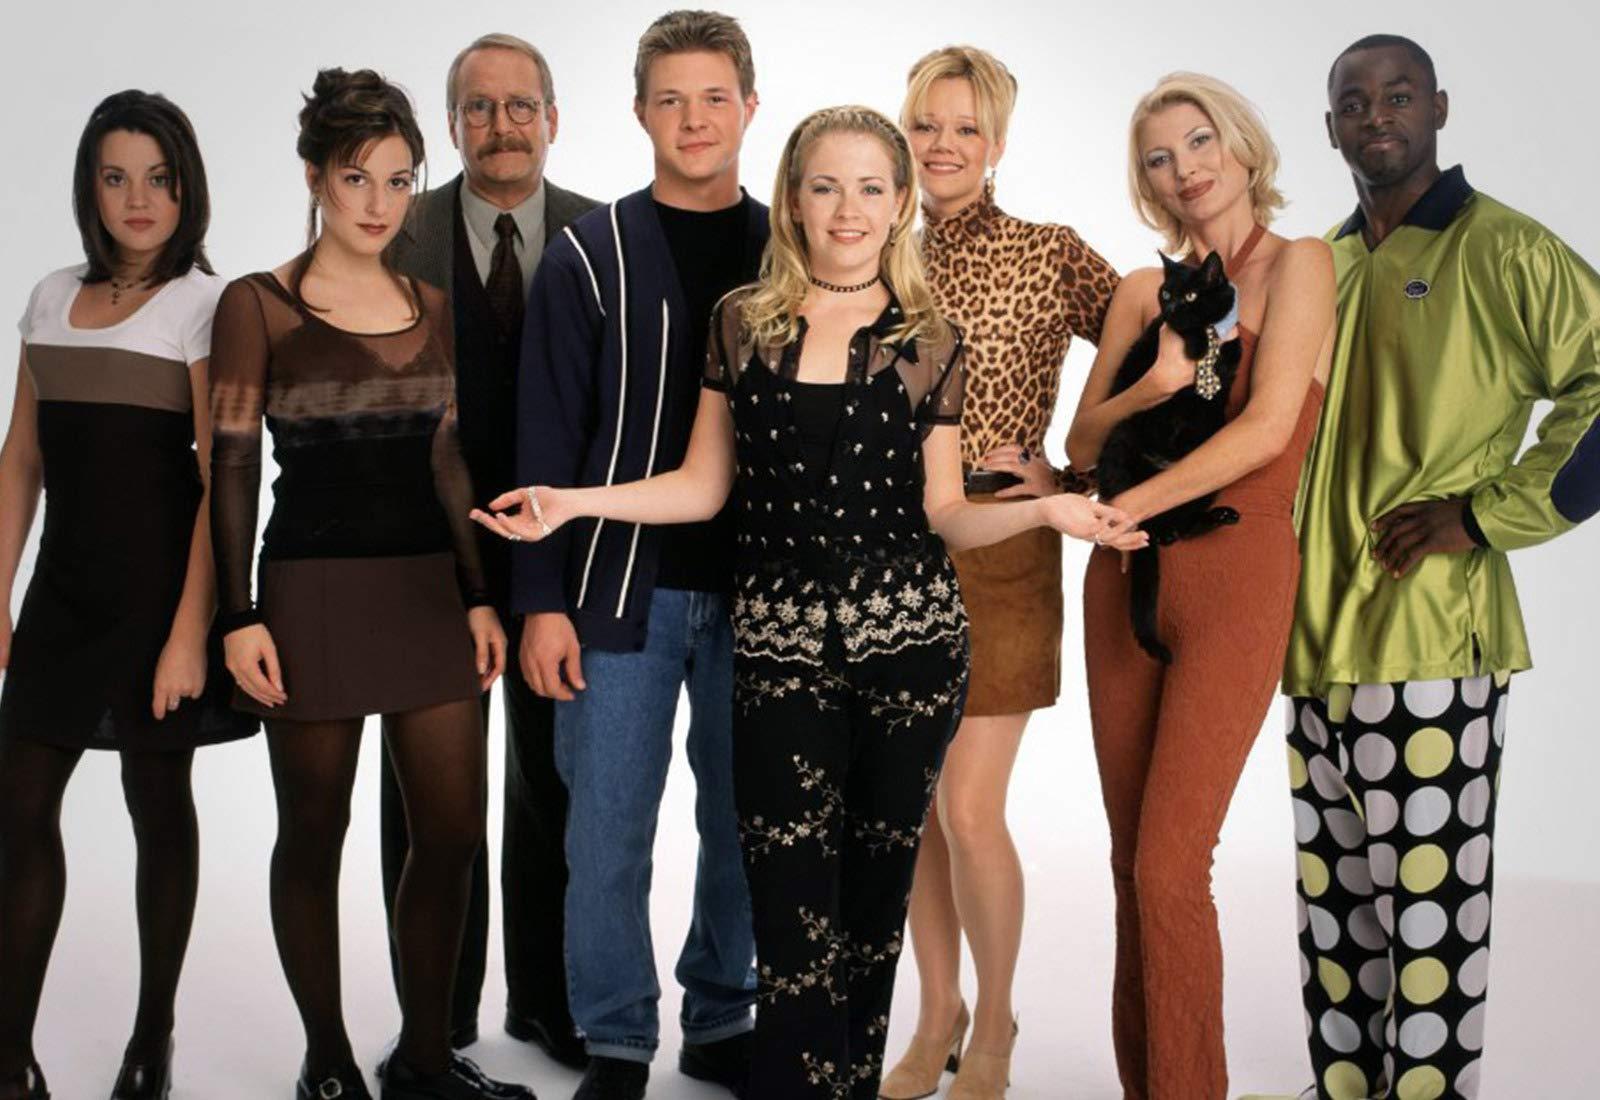 Sabrina: The Teenage Witch - Season 3